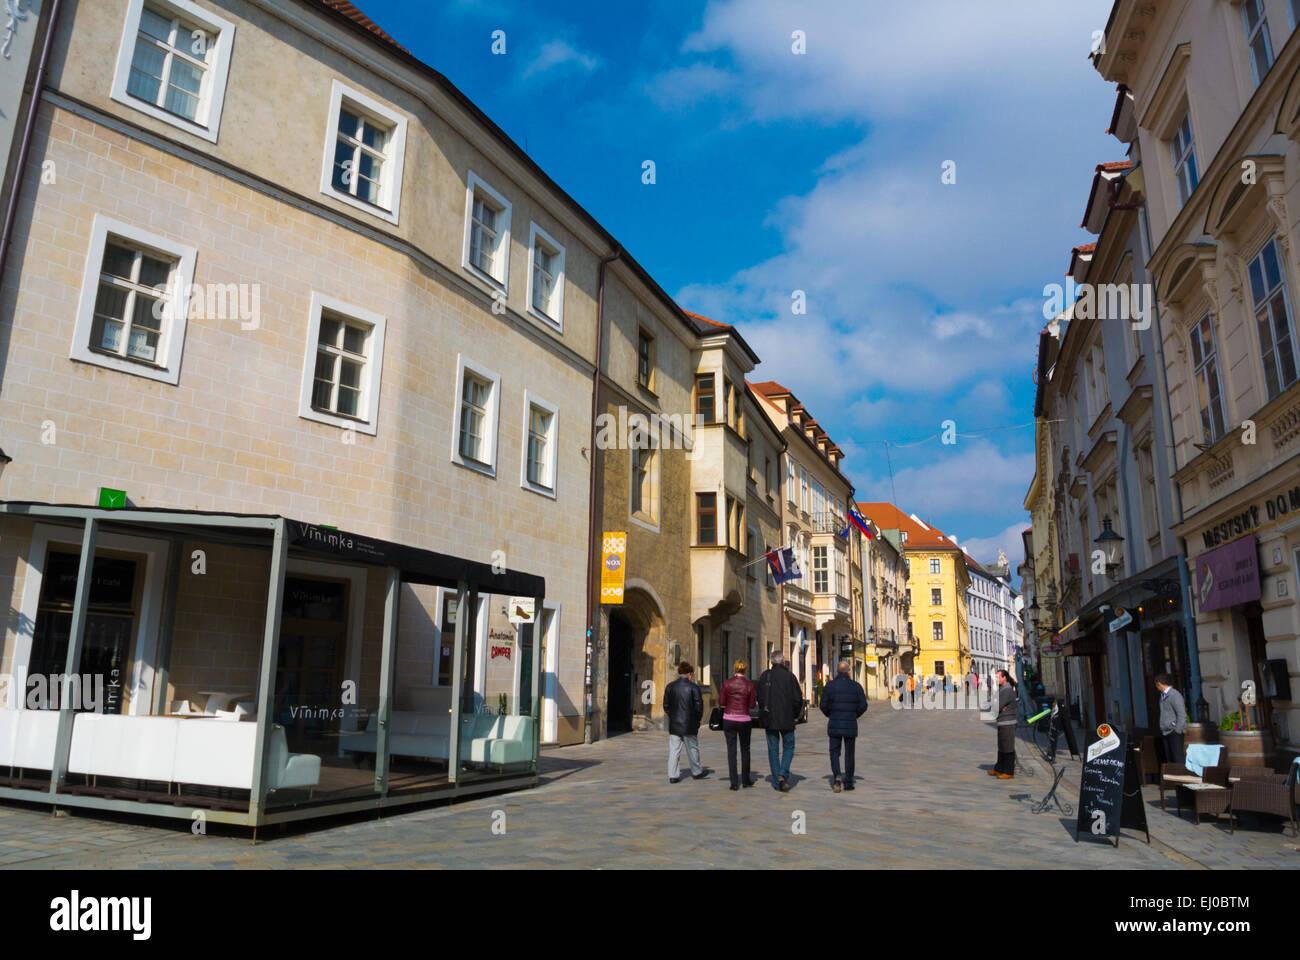 Venturska street, with many restaurants, bars and cafes, old town, Bratislava, Slovakia, Europe - Stock Image